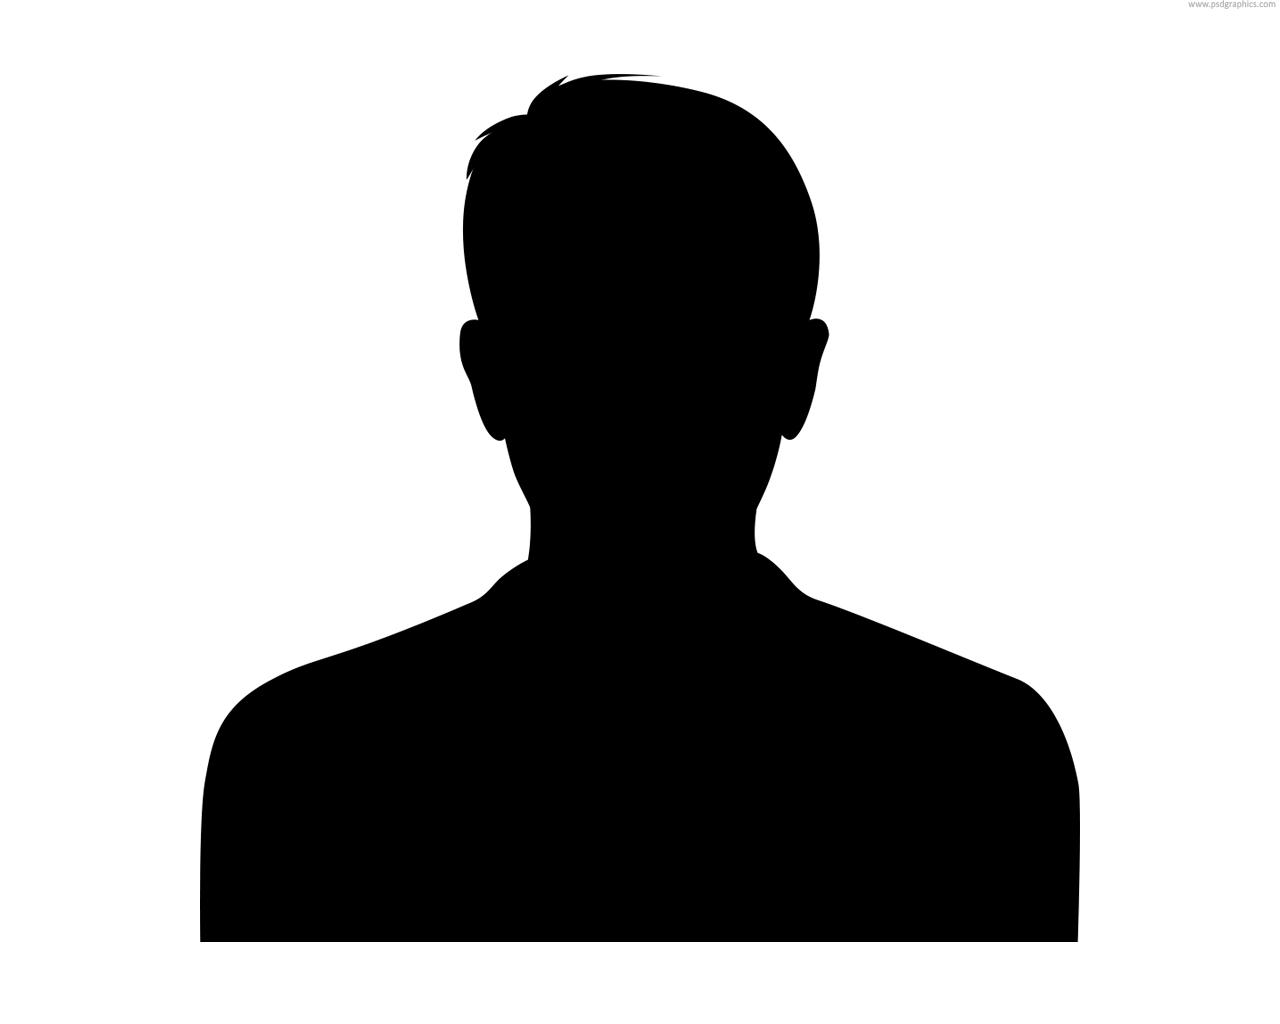 Male Silhouette Head